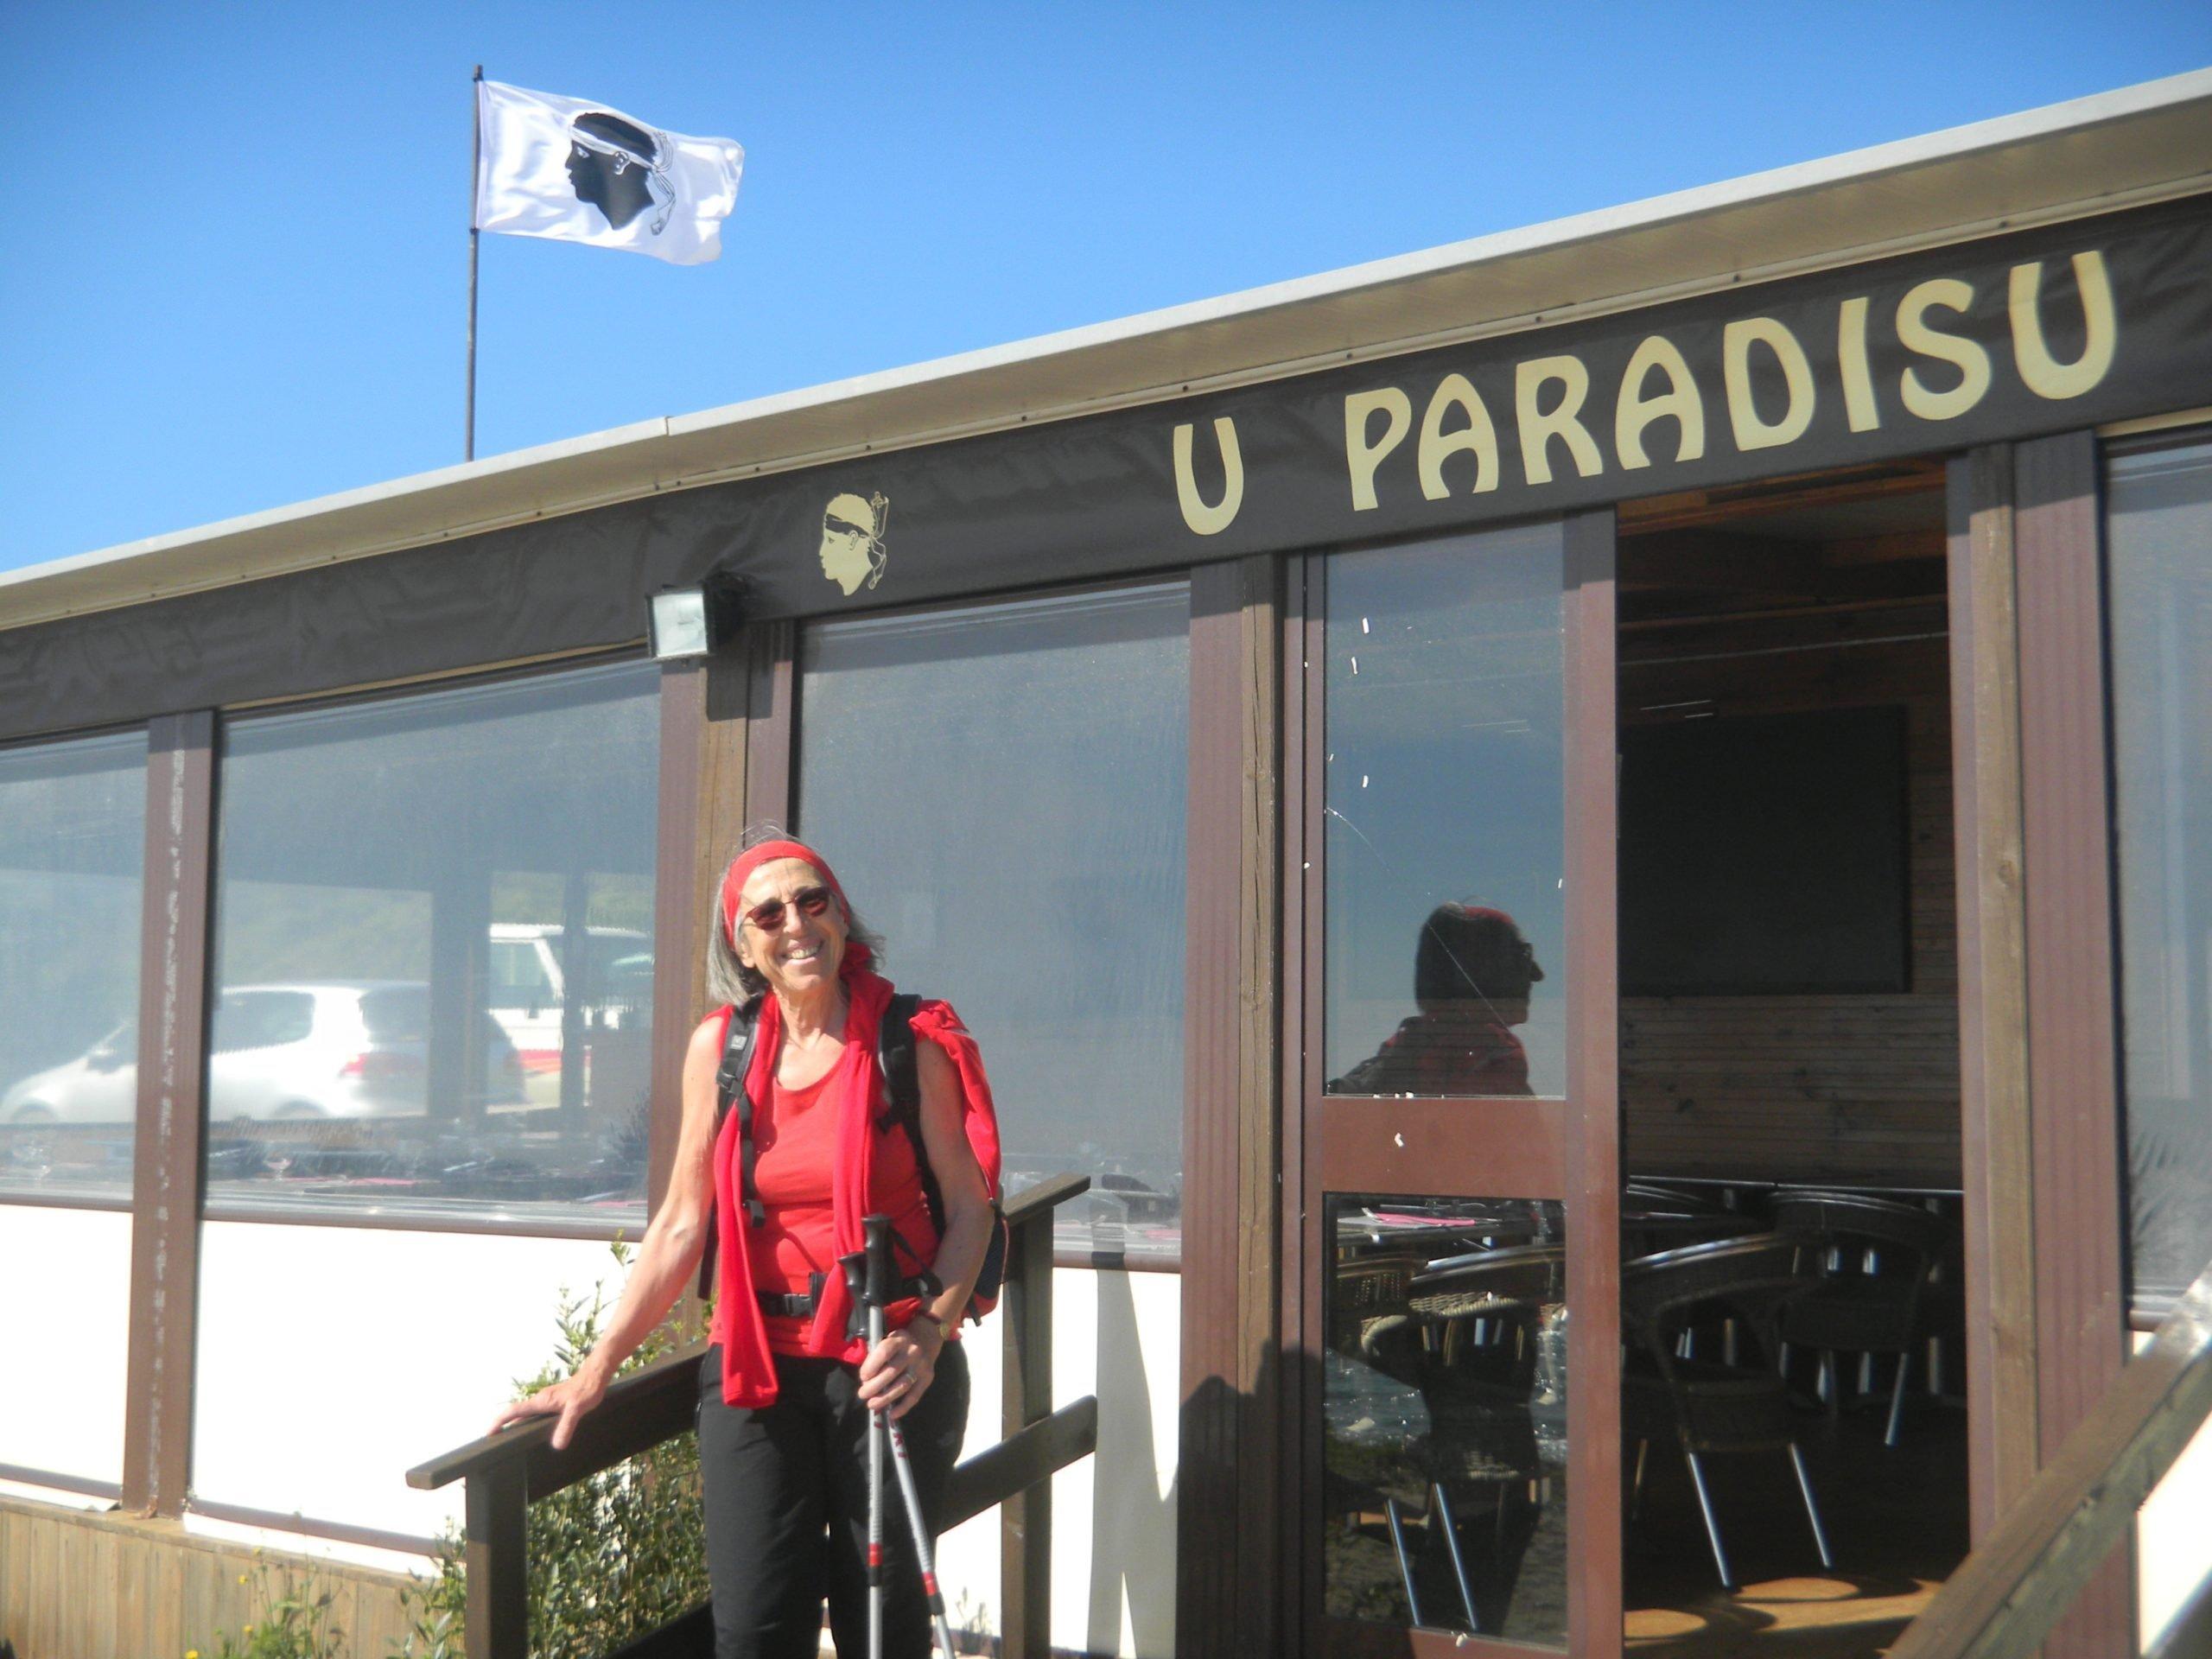 u-paradisu-corsica-sentiero-doganieri-trekkilandia